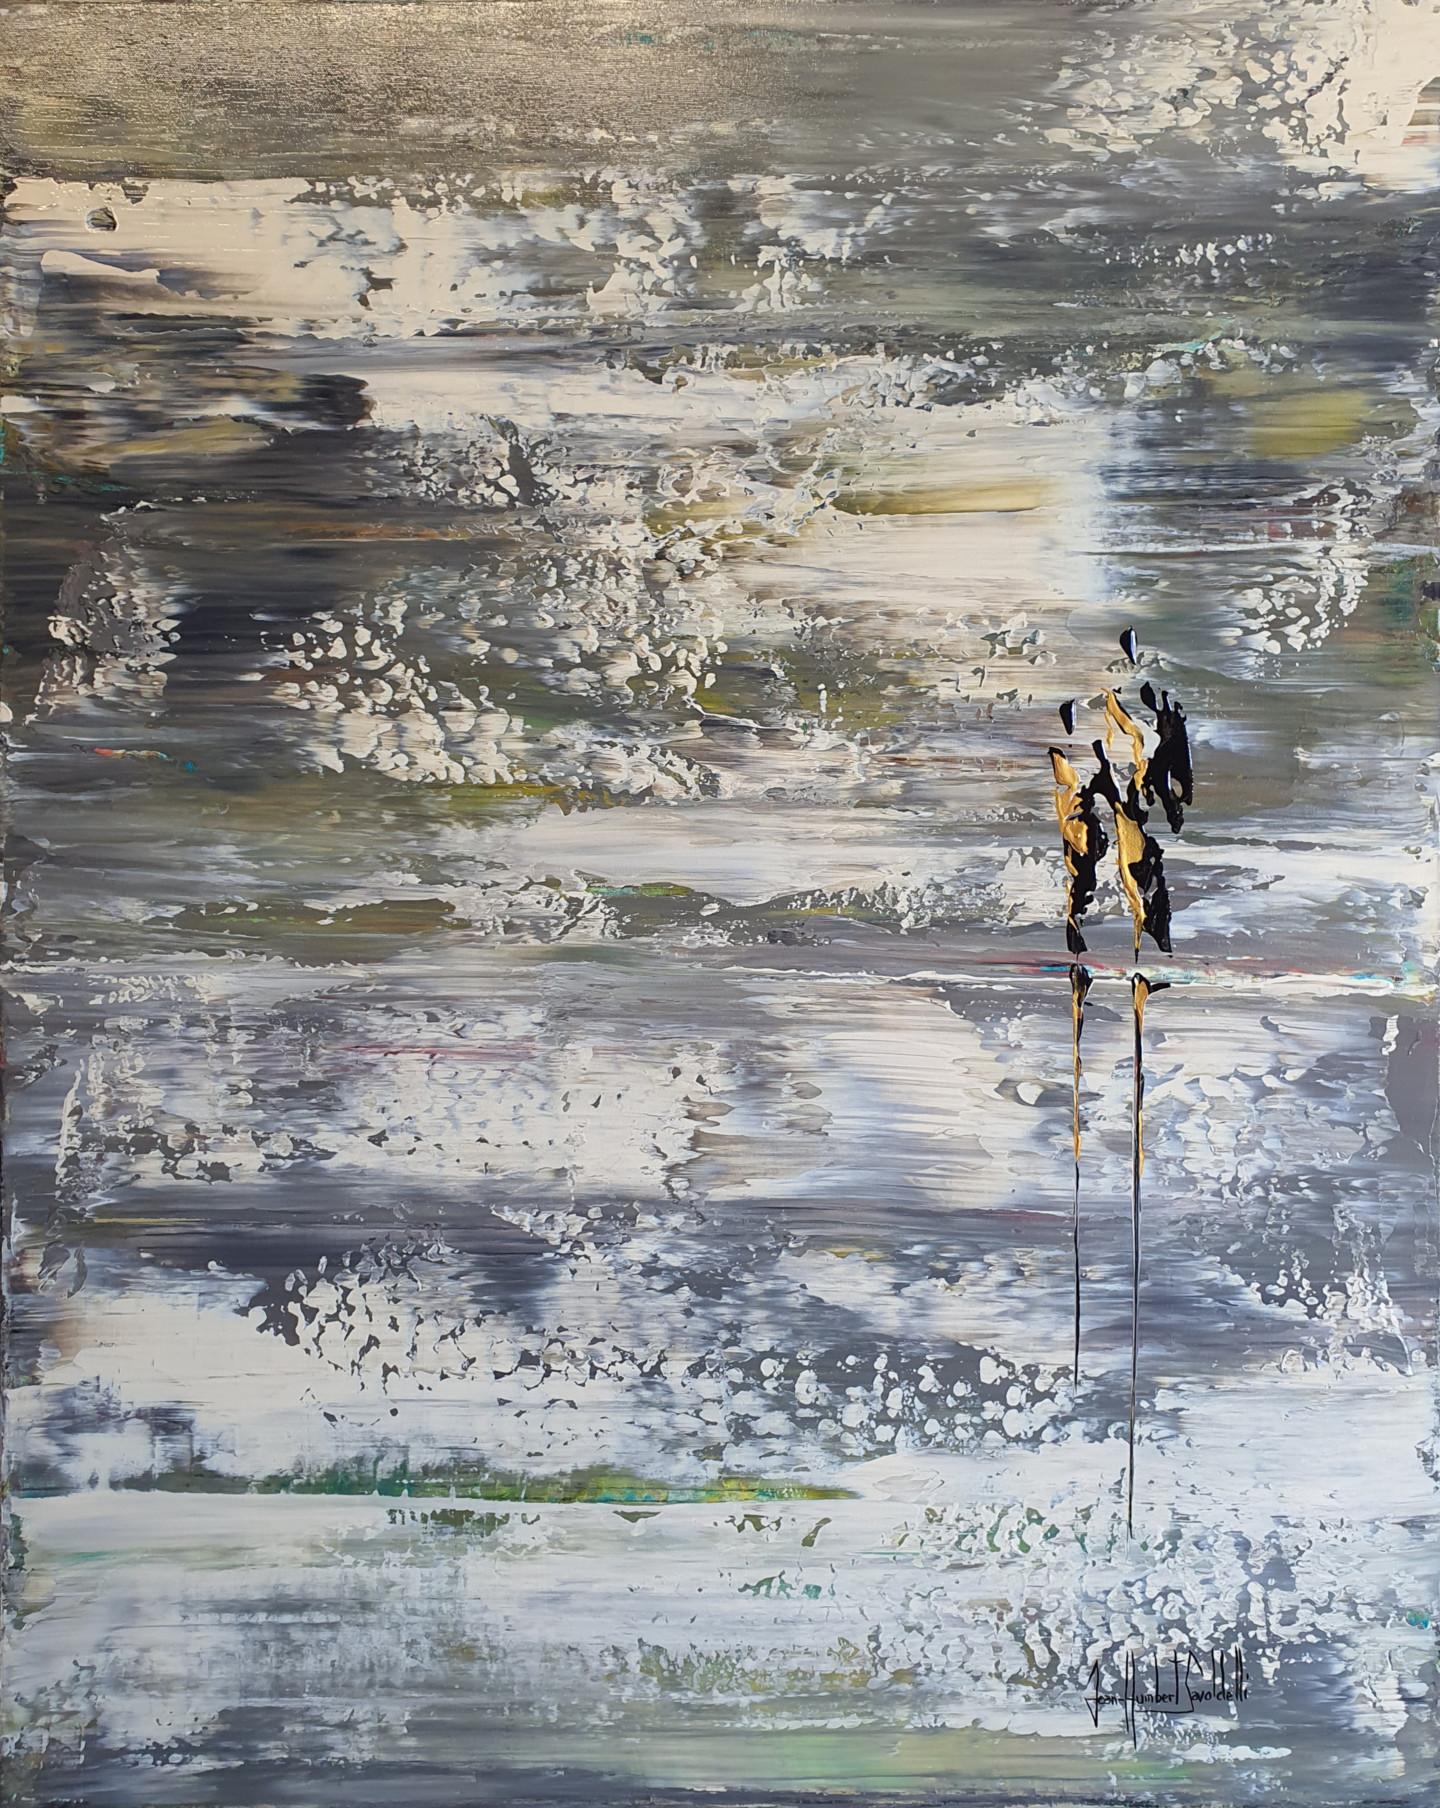 Jean-Humbert Savoldelli - RECONCILIATION